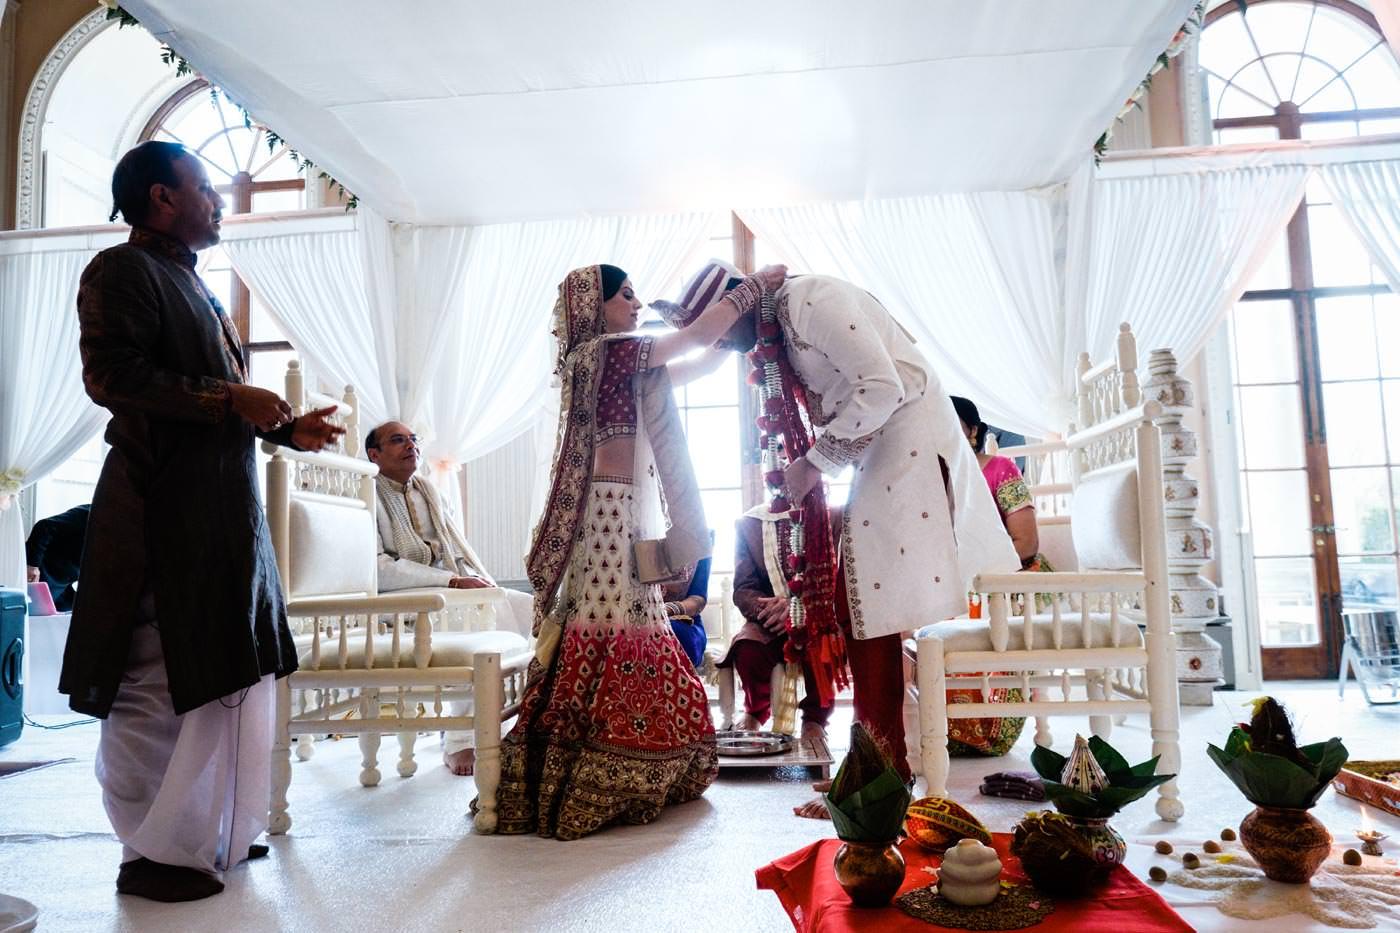 Bride and groom exchanging garlands at Hindu wedding at Ragley Hall